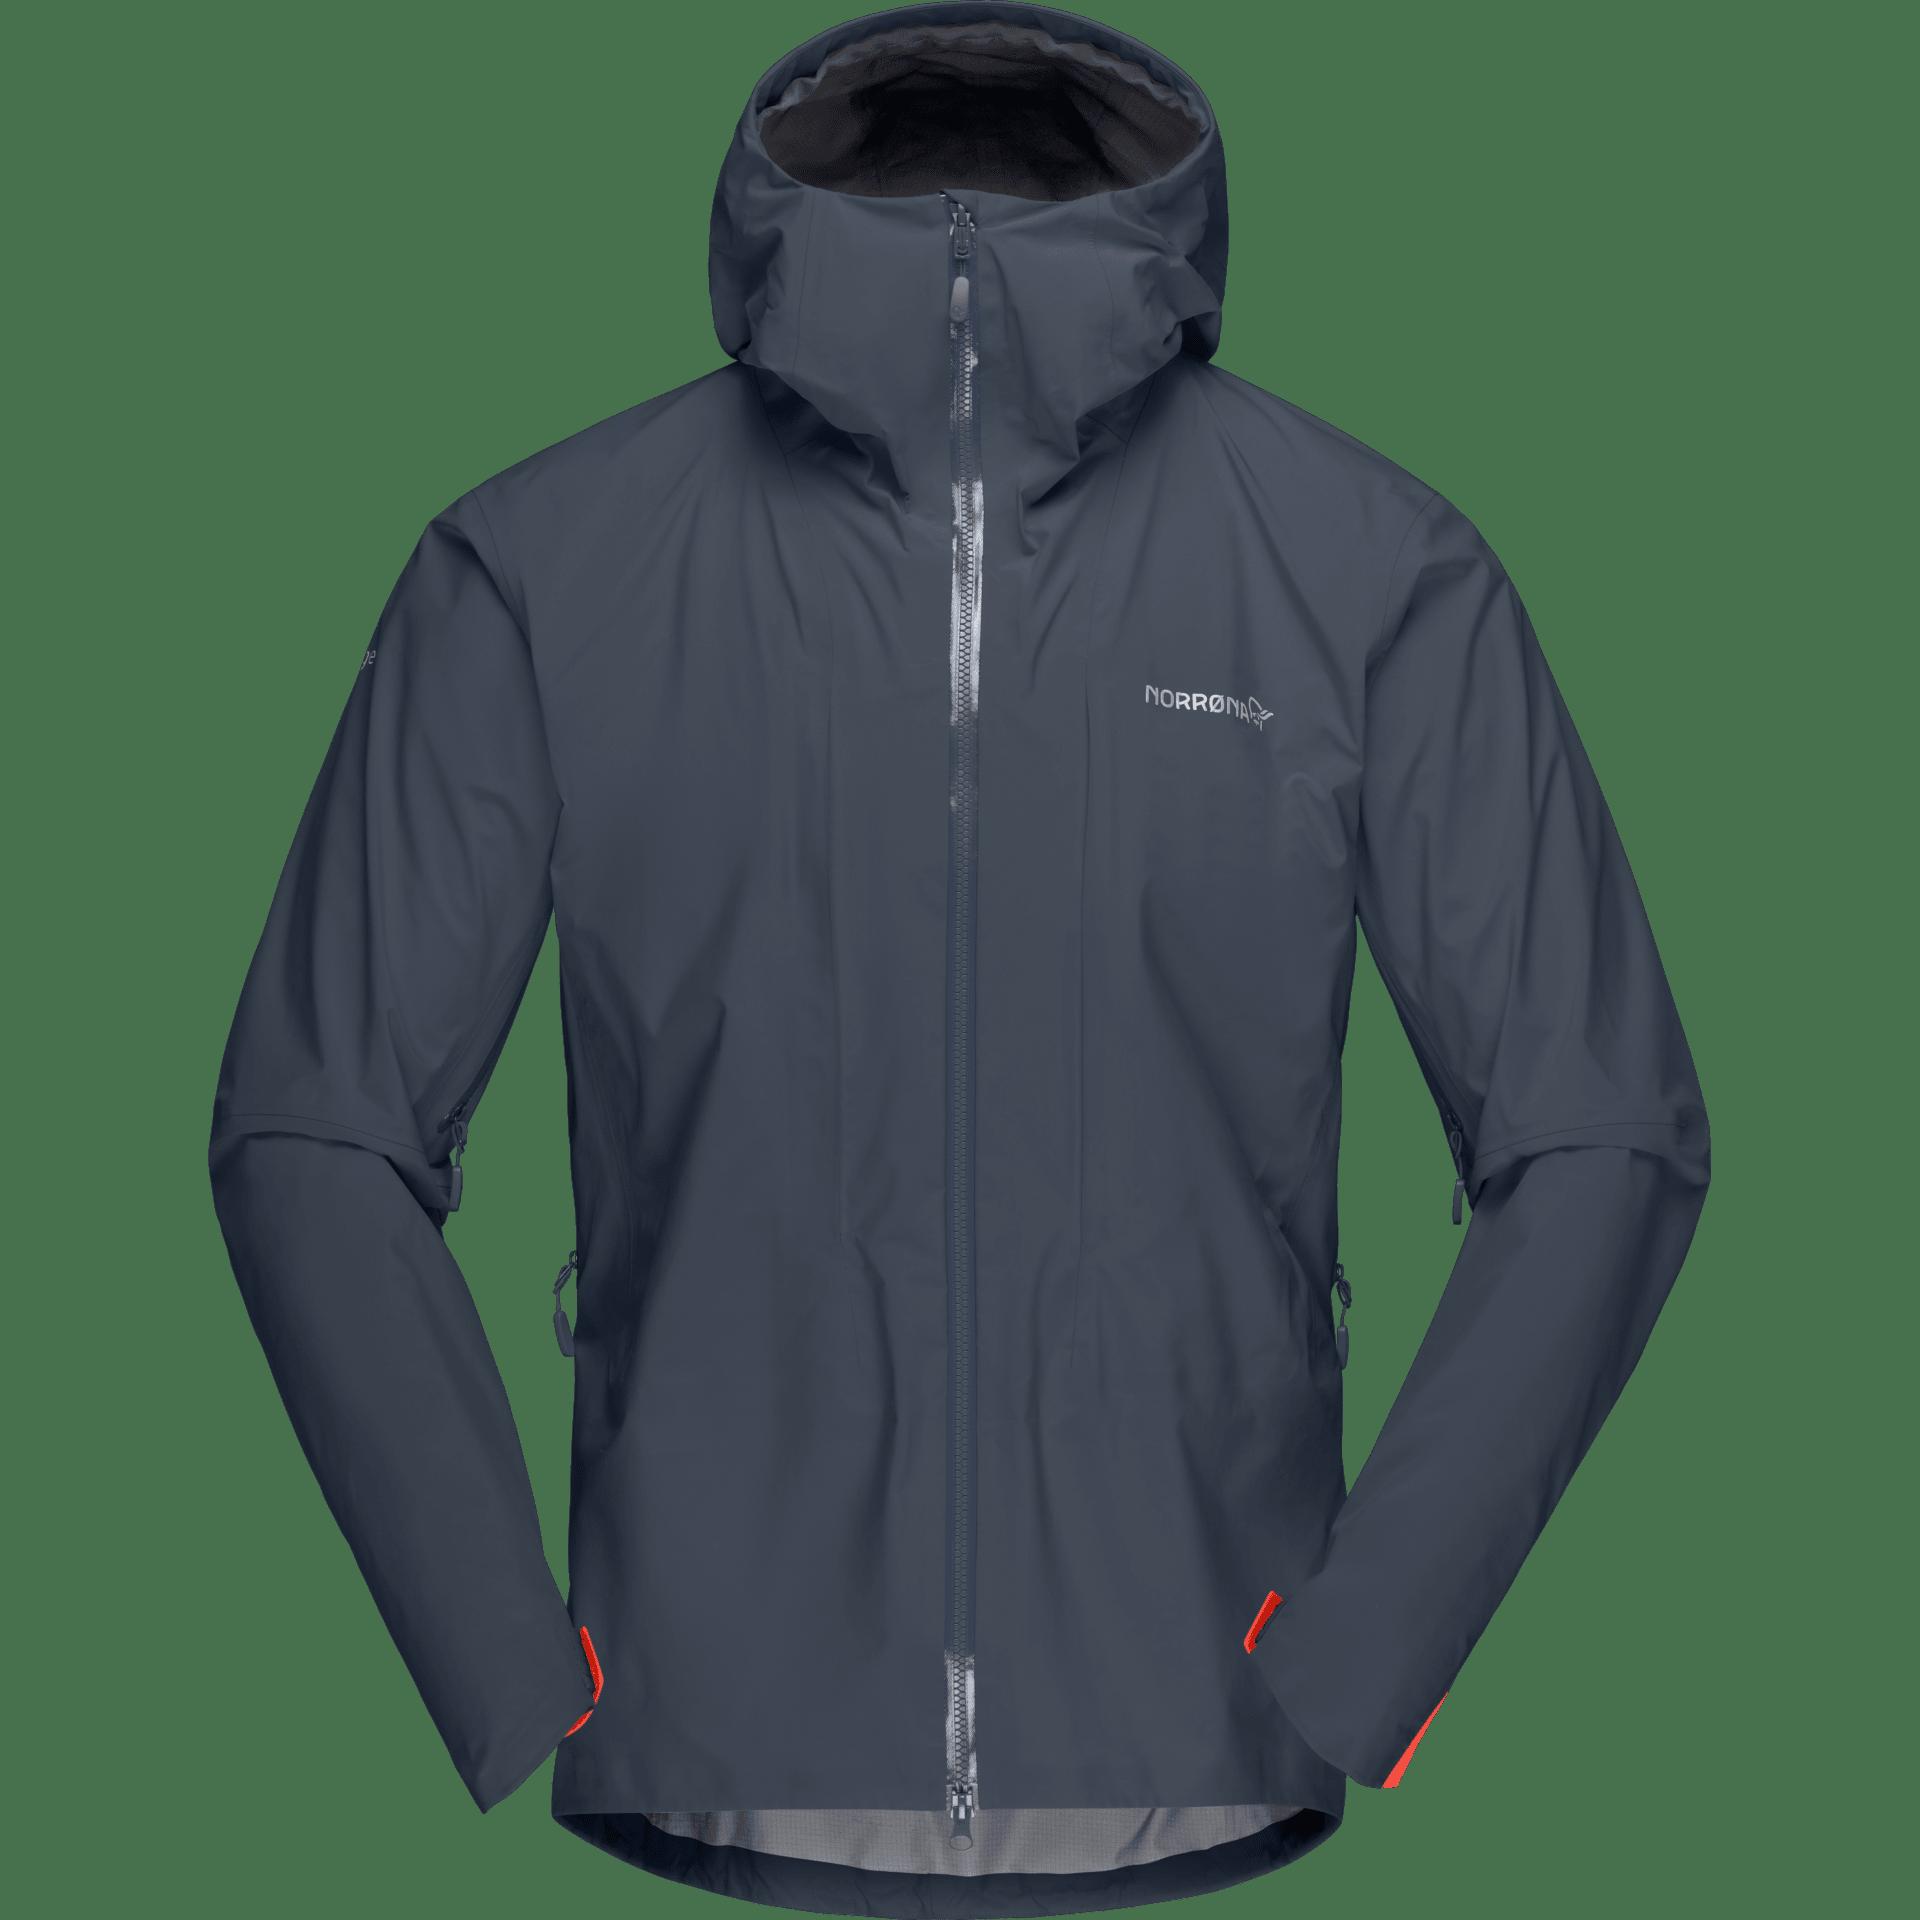 Norrøna Trollveggen Gore-Tex Pro Light Jacket - Hardshell jacket - Men's